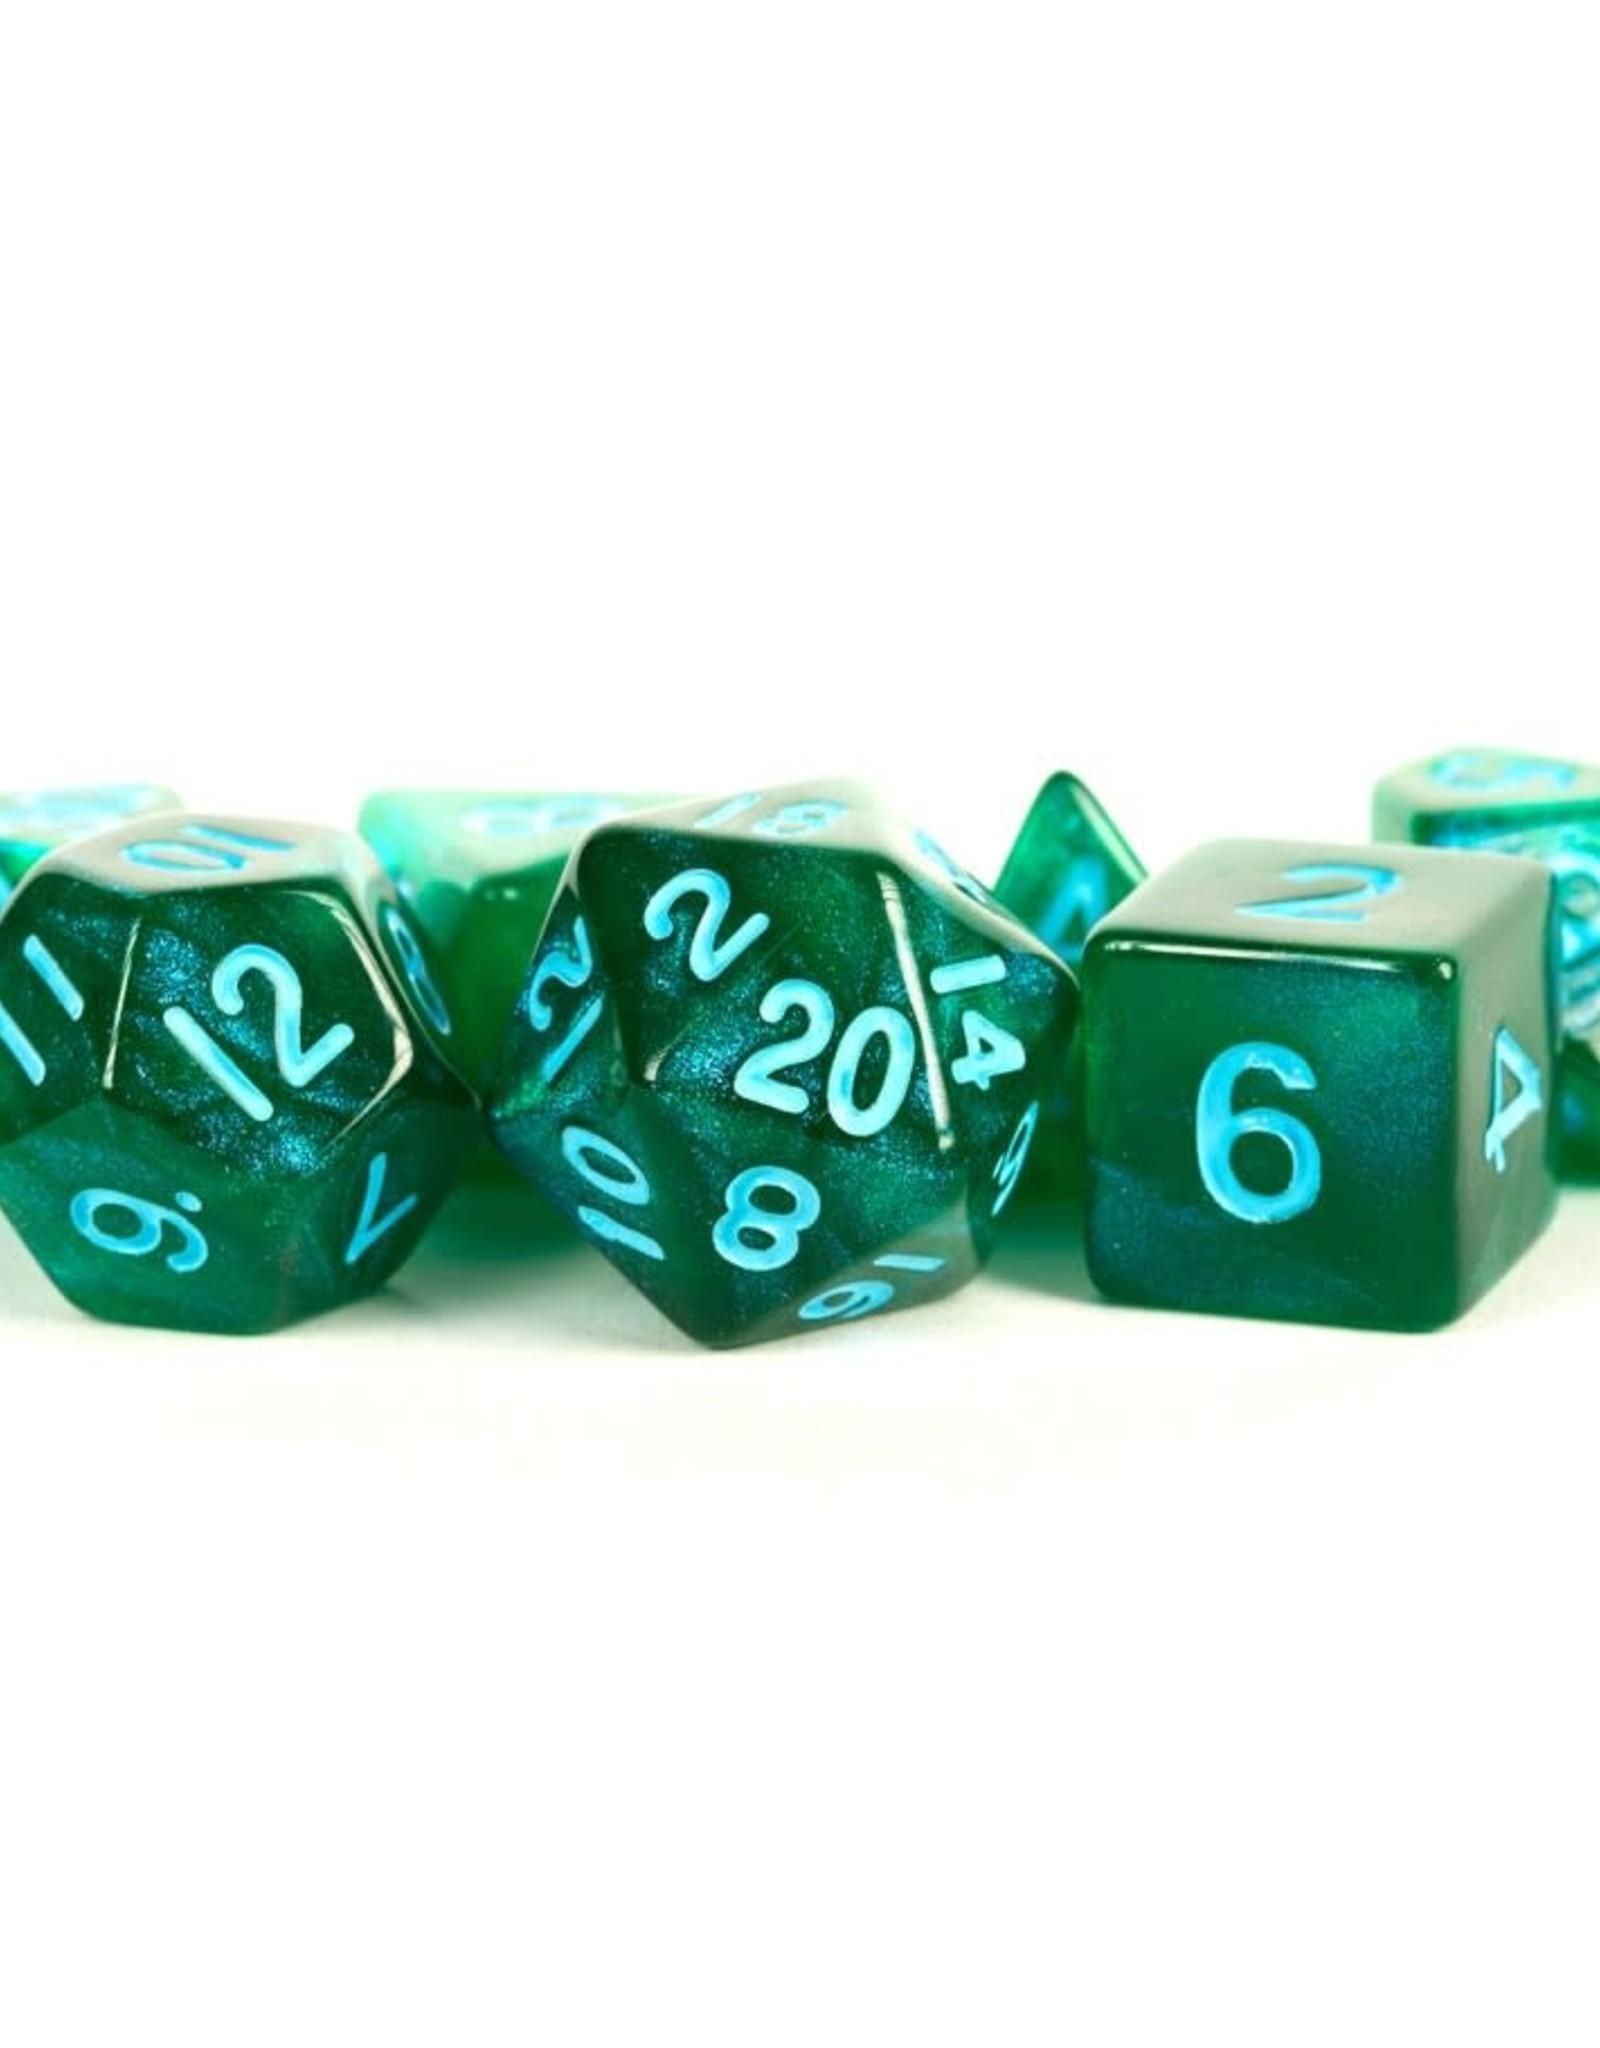 Metallic Dice Game 7 set dice: Stardust Green w/ Blue